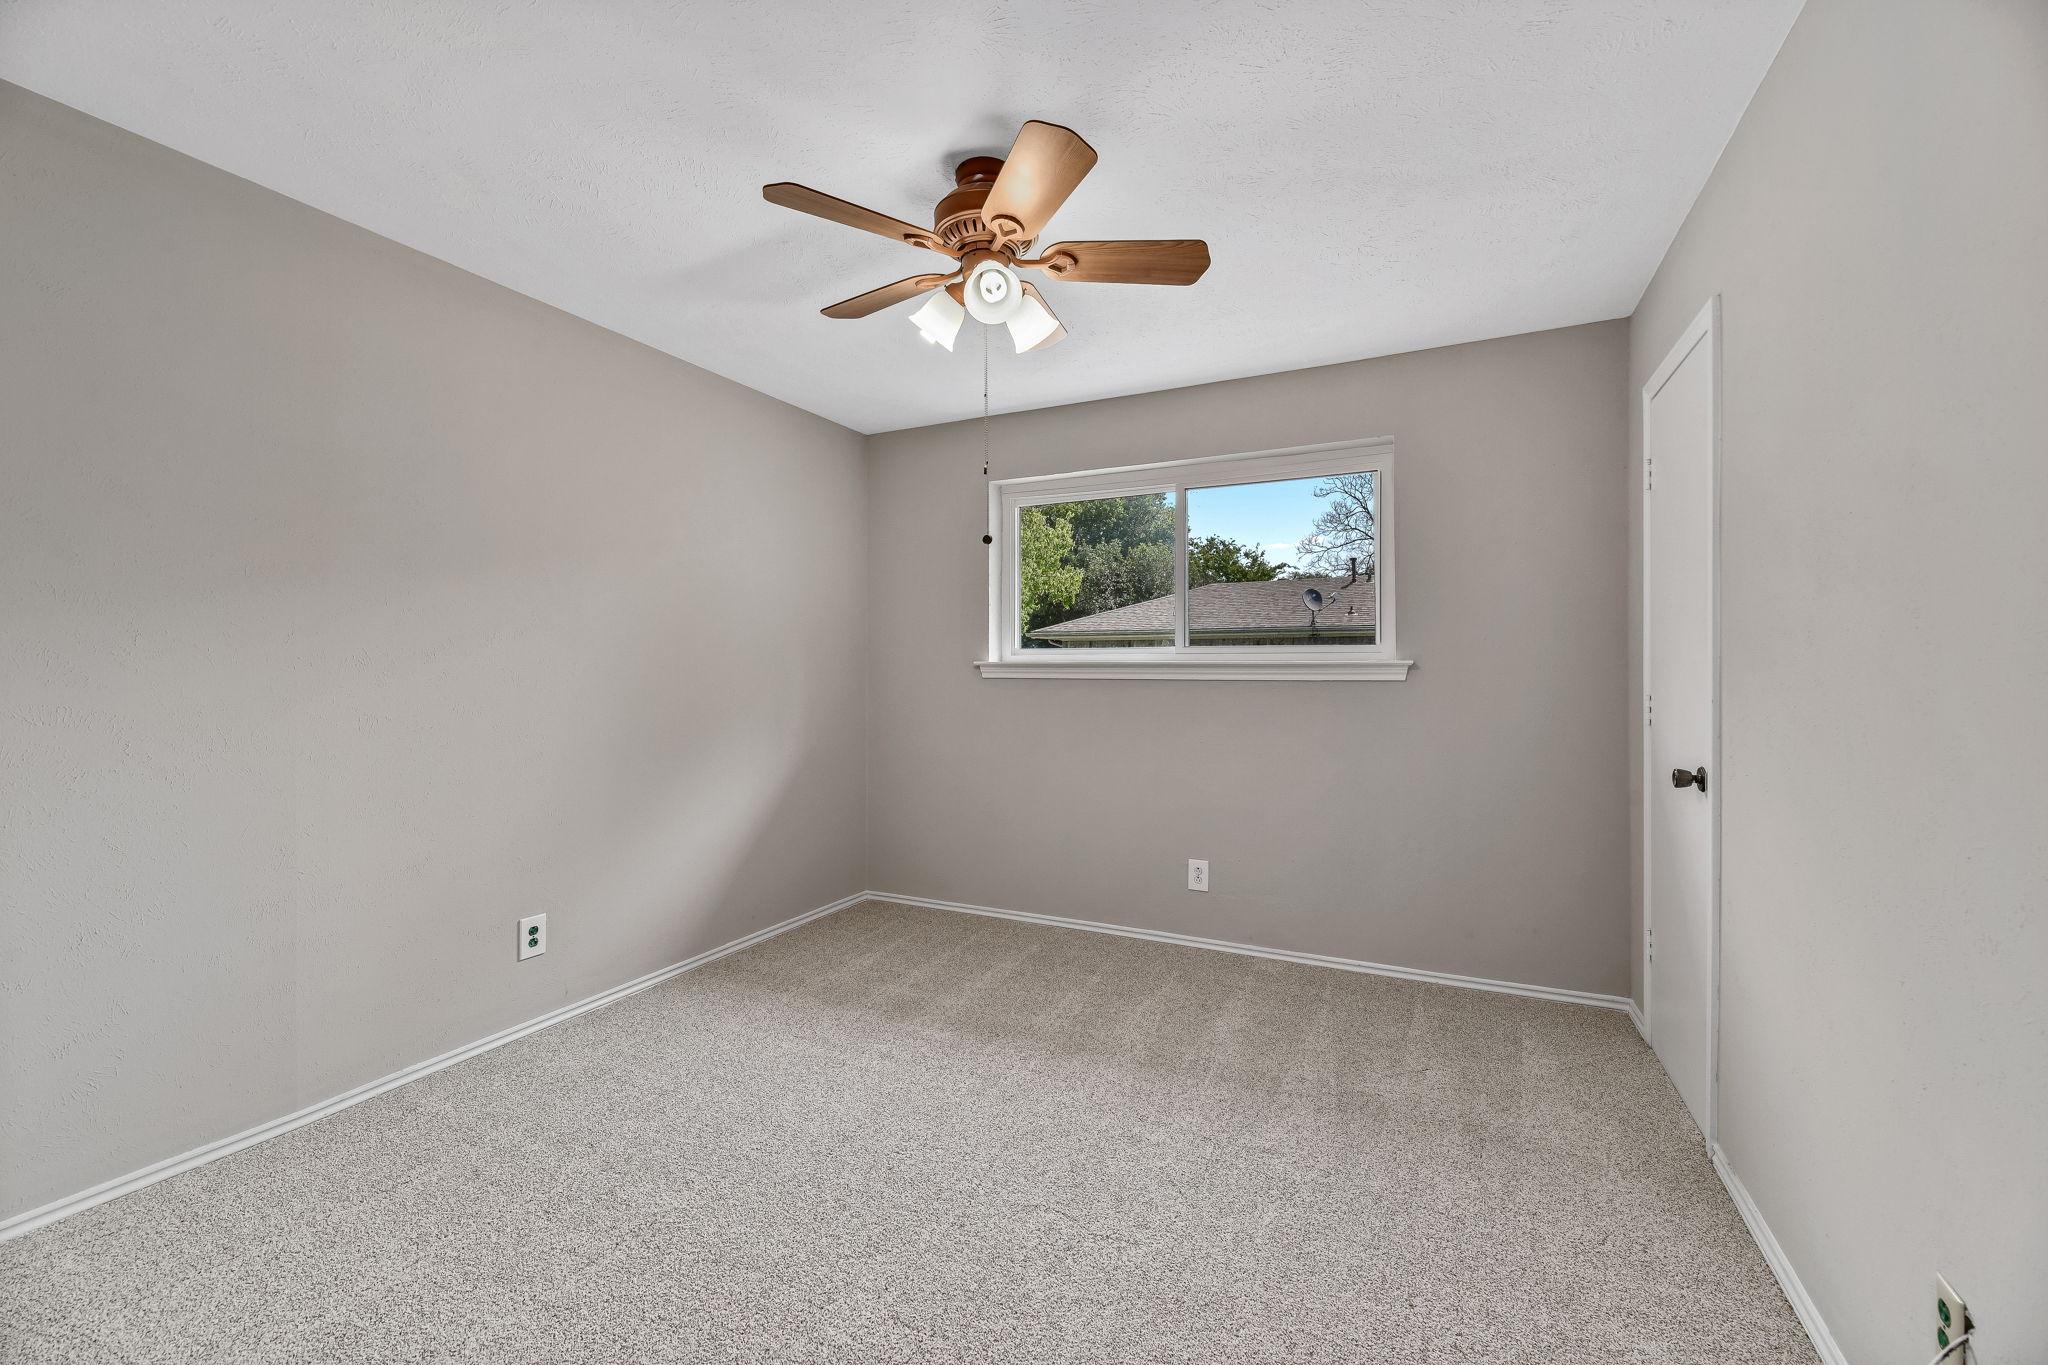 022-Bedroom 3-FULL